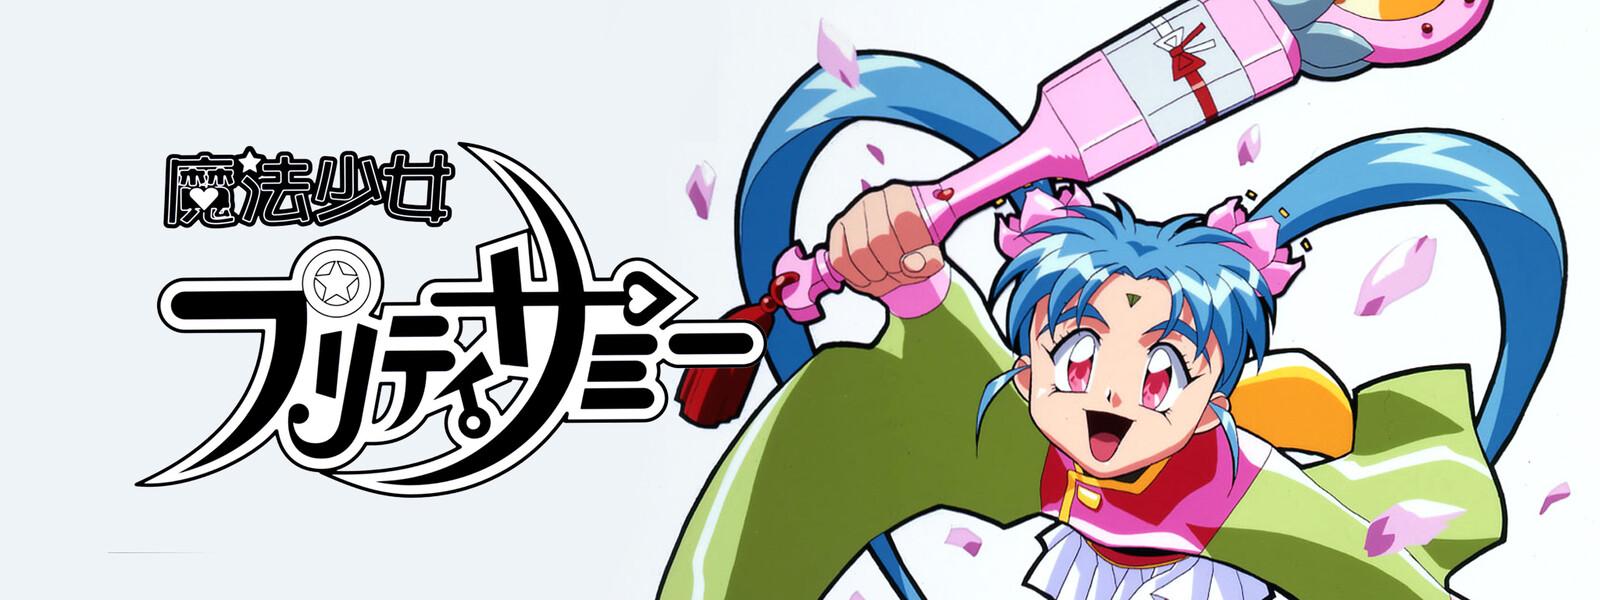 TVシリーズ 魔法少女プリティサミーの動画 - OVA 魔法少女プリティサミー